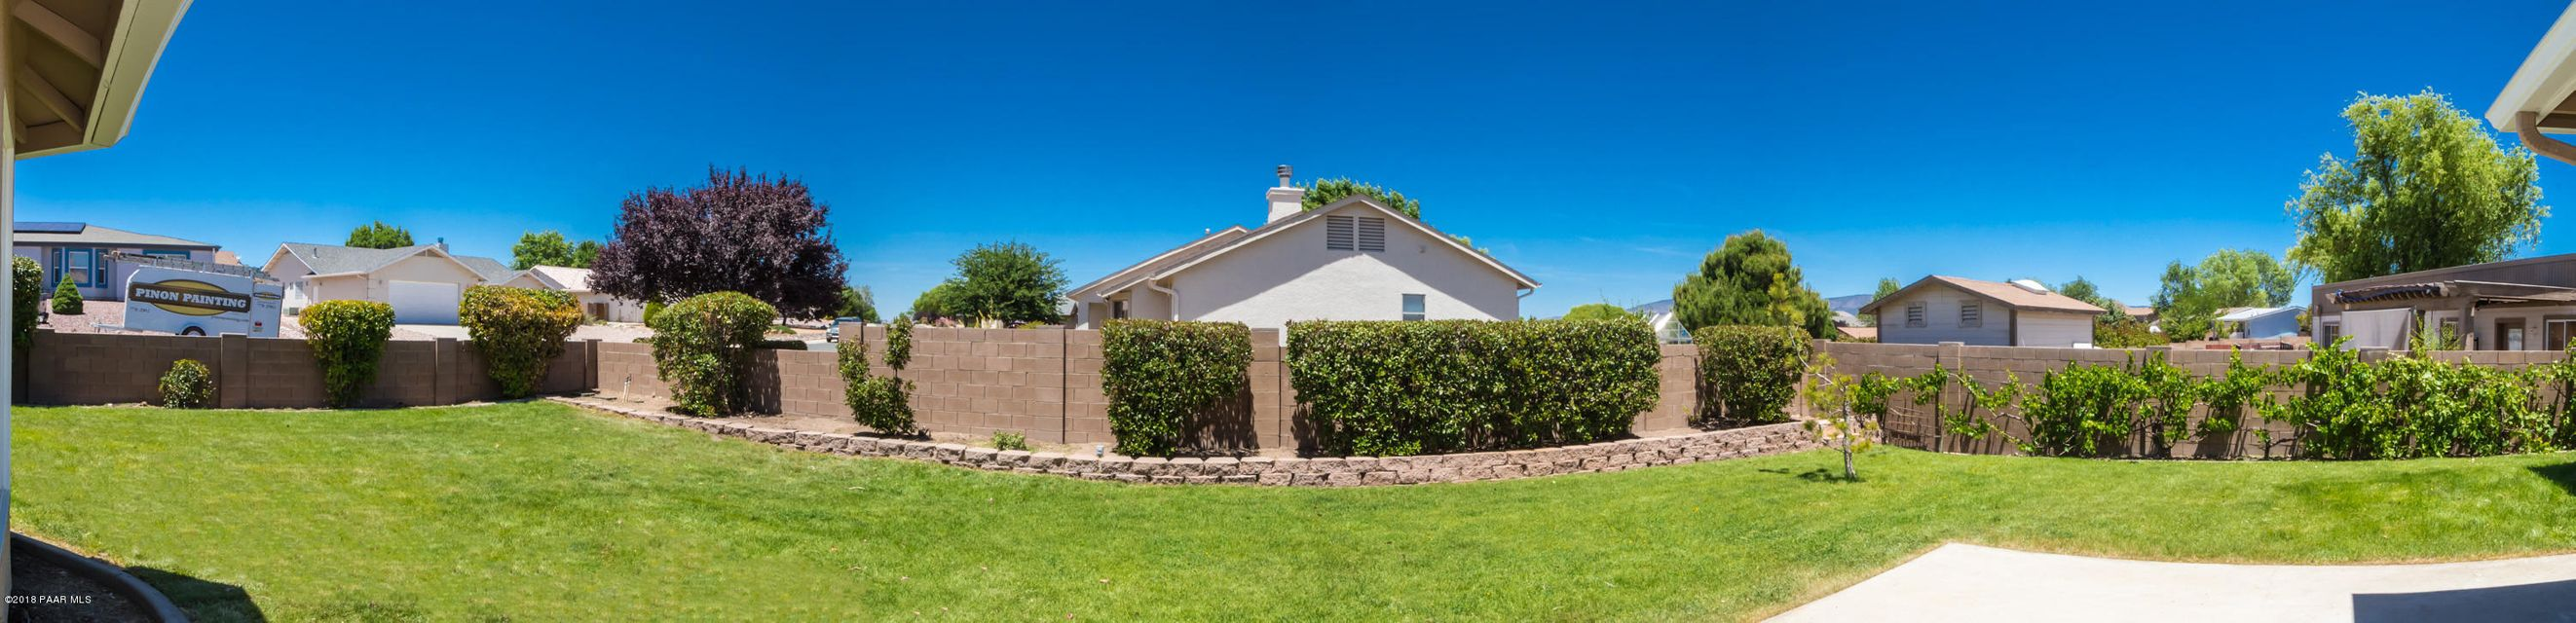 7204 E Horizon Way Prescott Valley, AZ 86315 - MLS #: 1012963